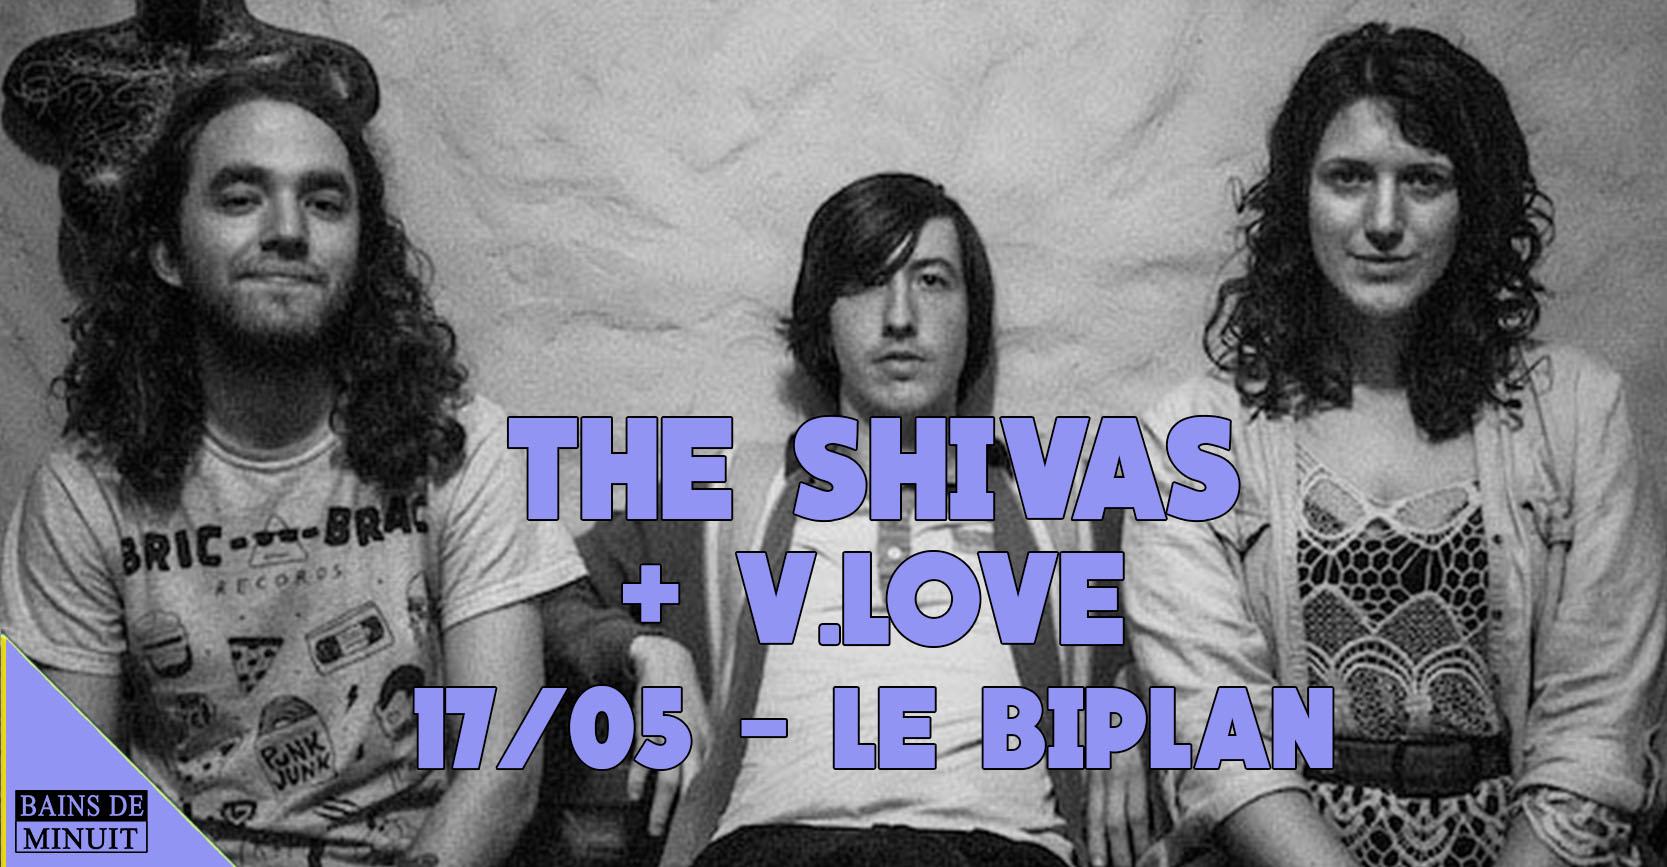 17/05 – THE SHIVAS + V.LOVE / Le Biplan, Lille